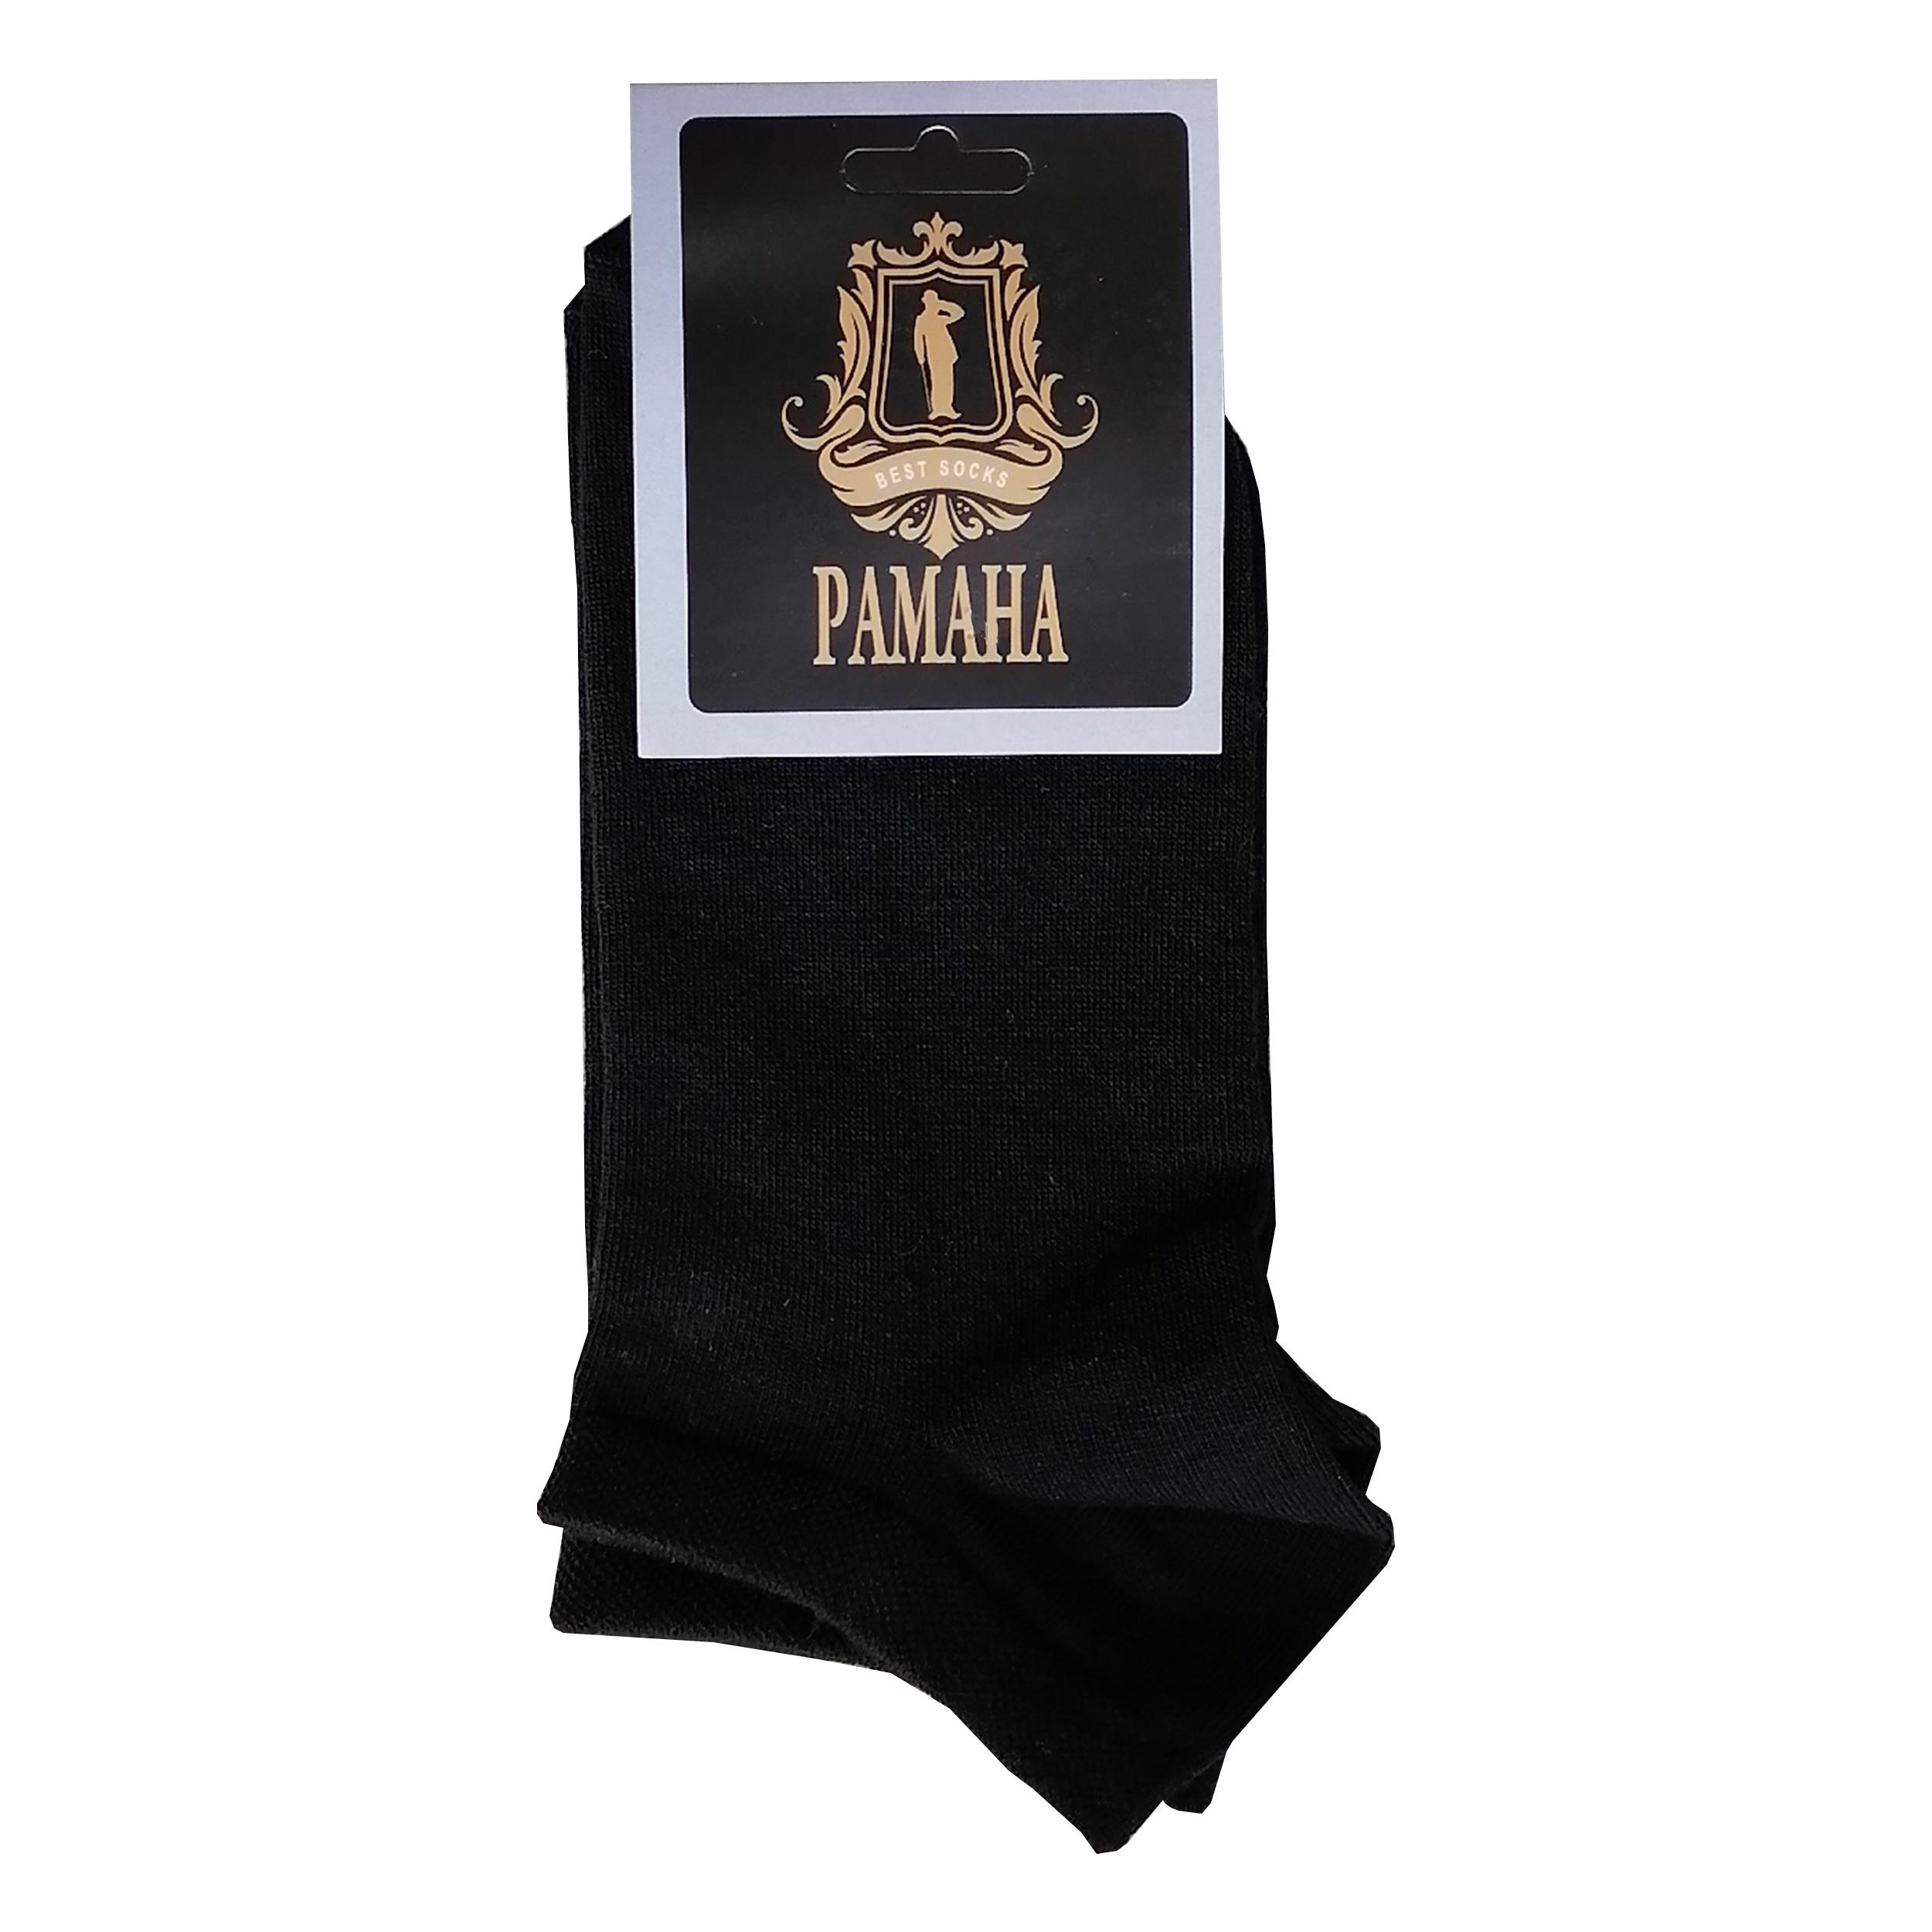 جوراب پاماها کد 002